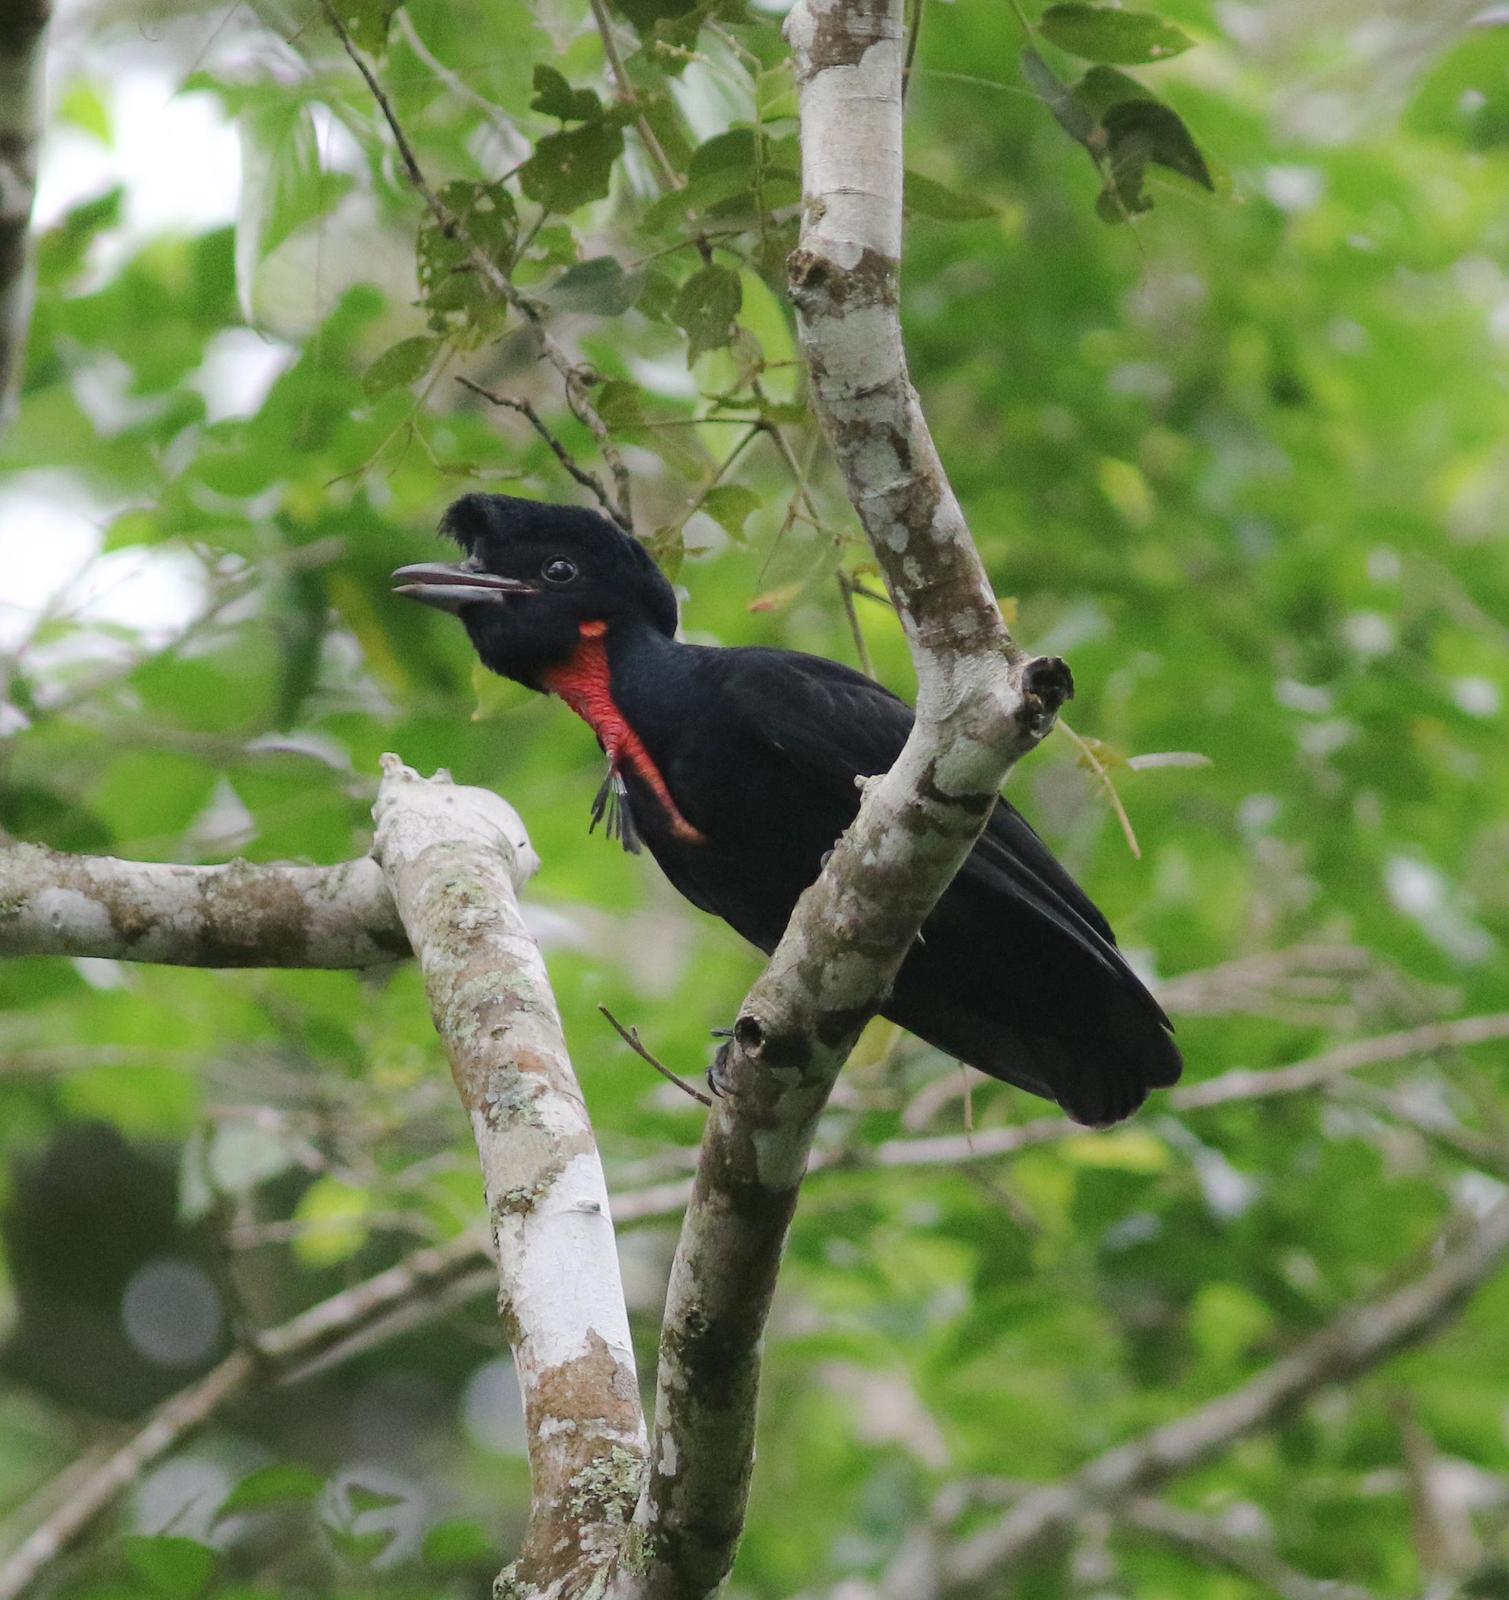 Bare-necked Umbrellabird Photo by Leonardo Garrigues